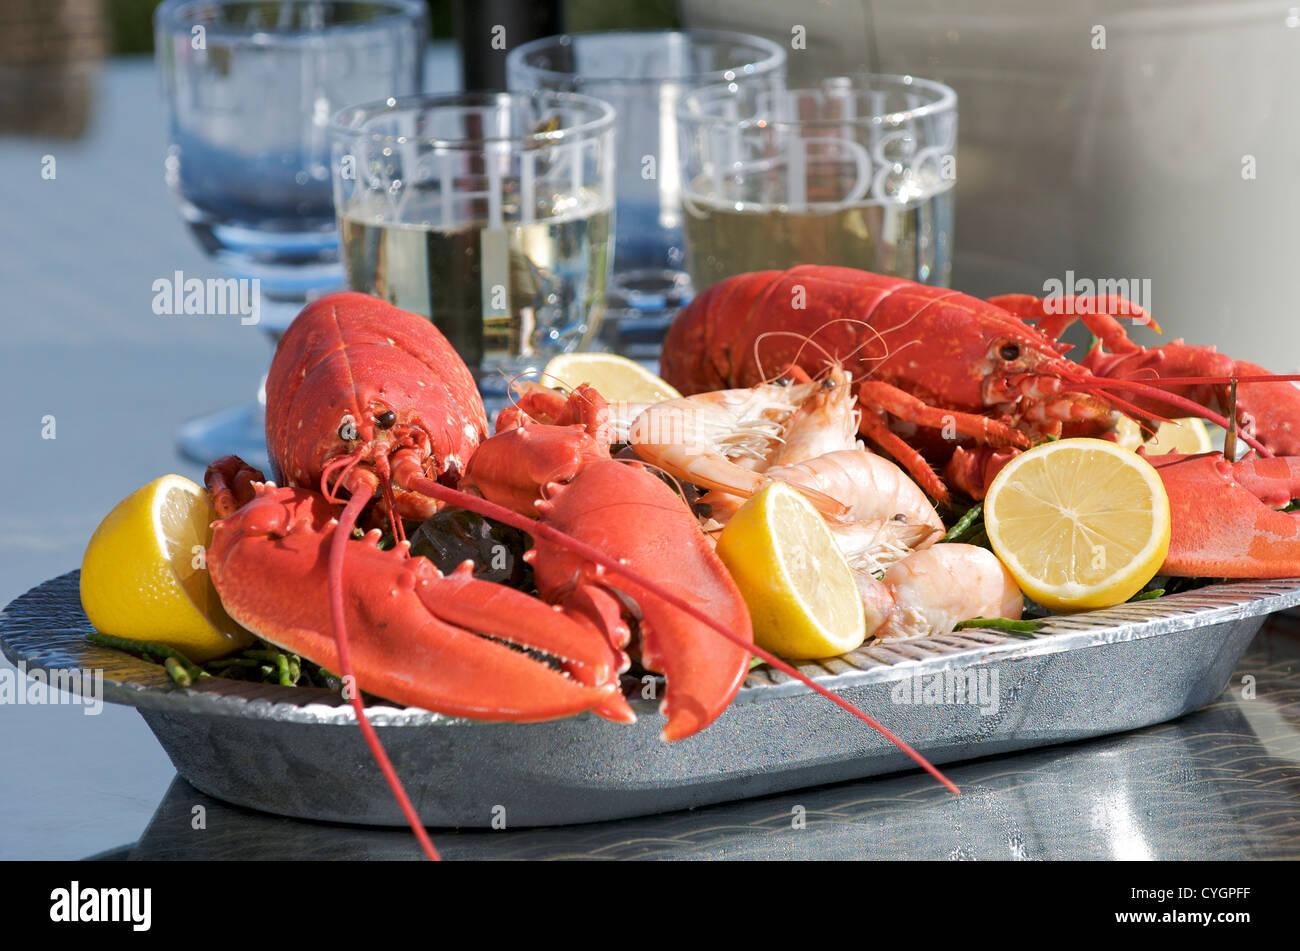 Lobster platter - Stock Image